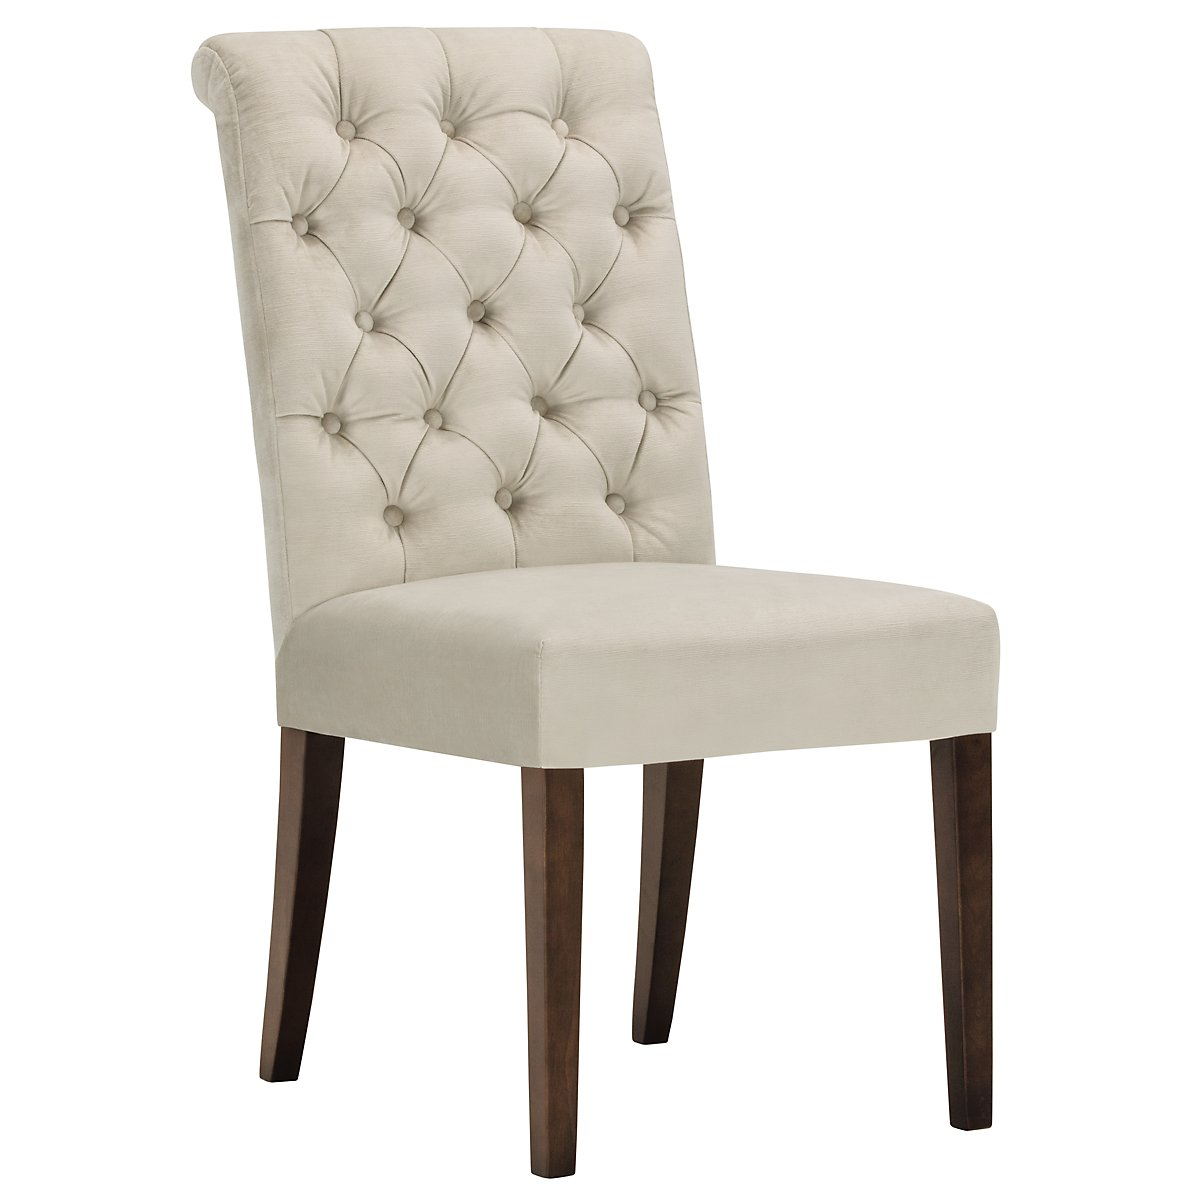 Sloane Light Beige Fabric Upholstered Side Chair